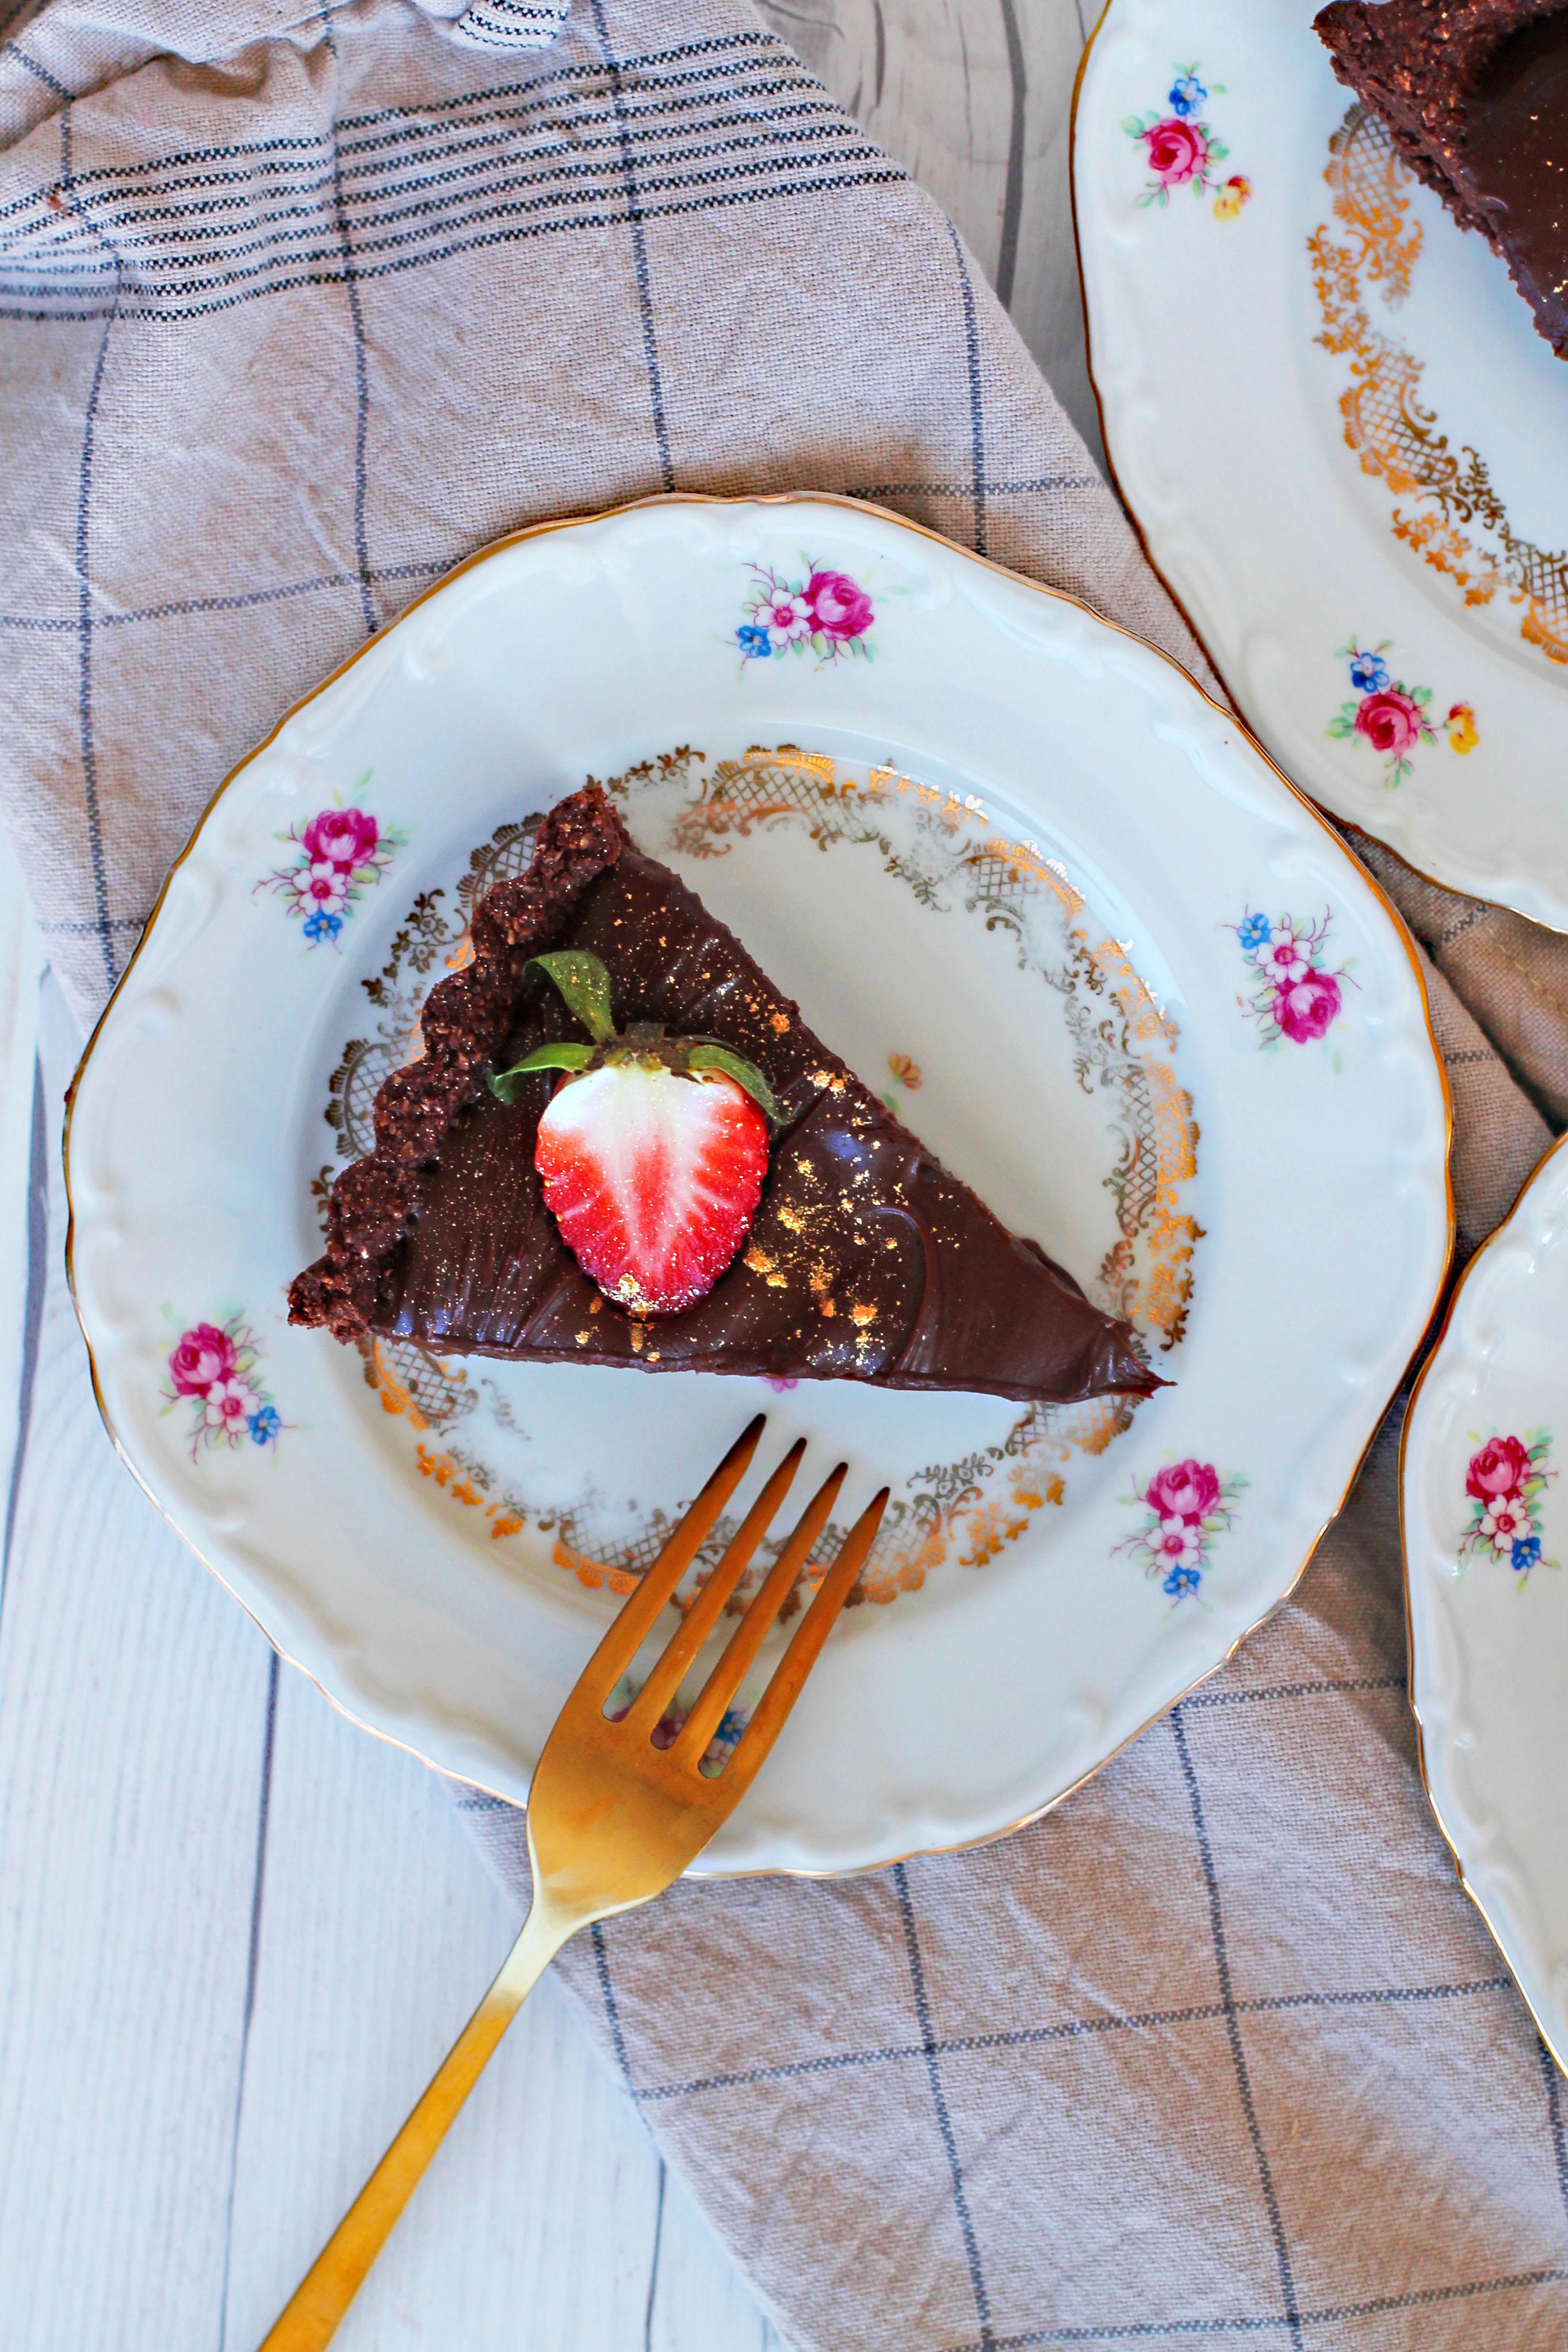 vegansk chokladbollspaj